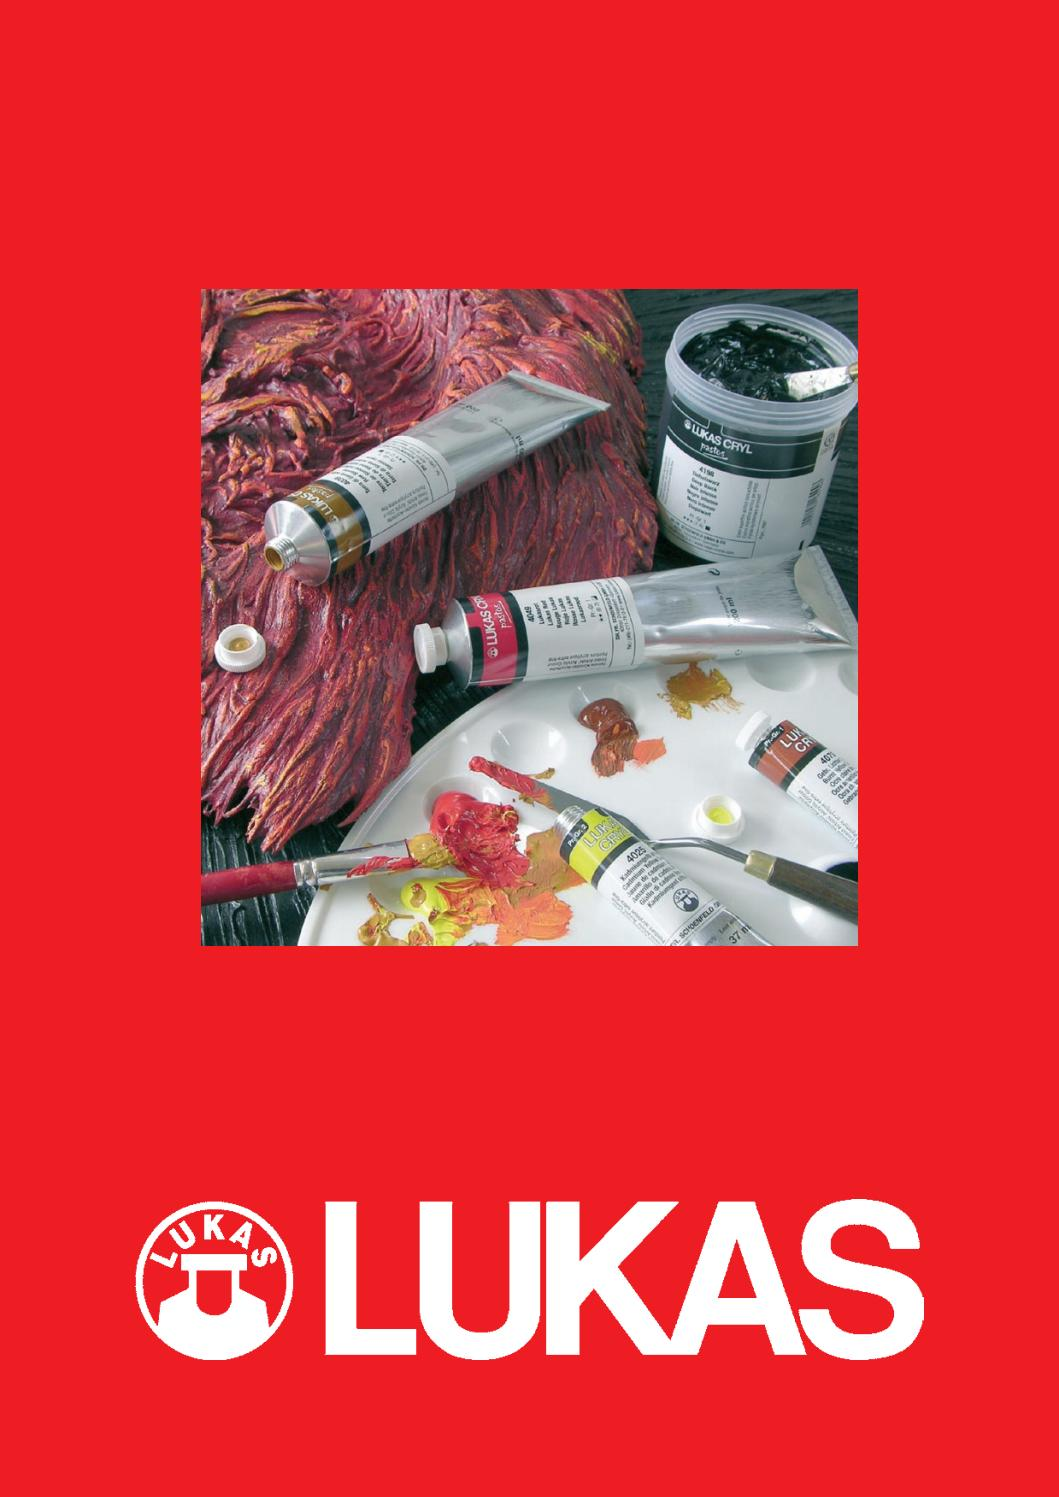 Lukas 5409 goldtoray plat pinceau taille 6